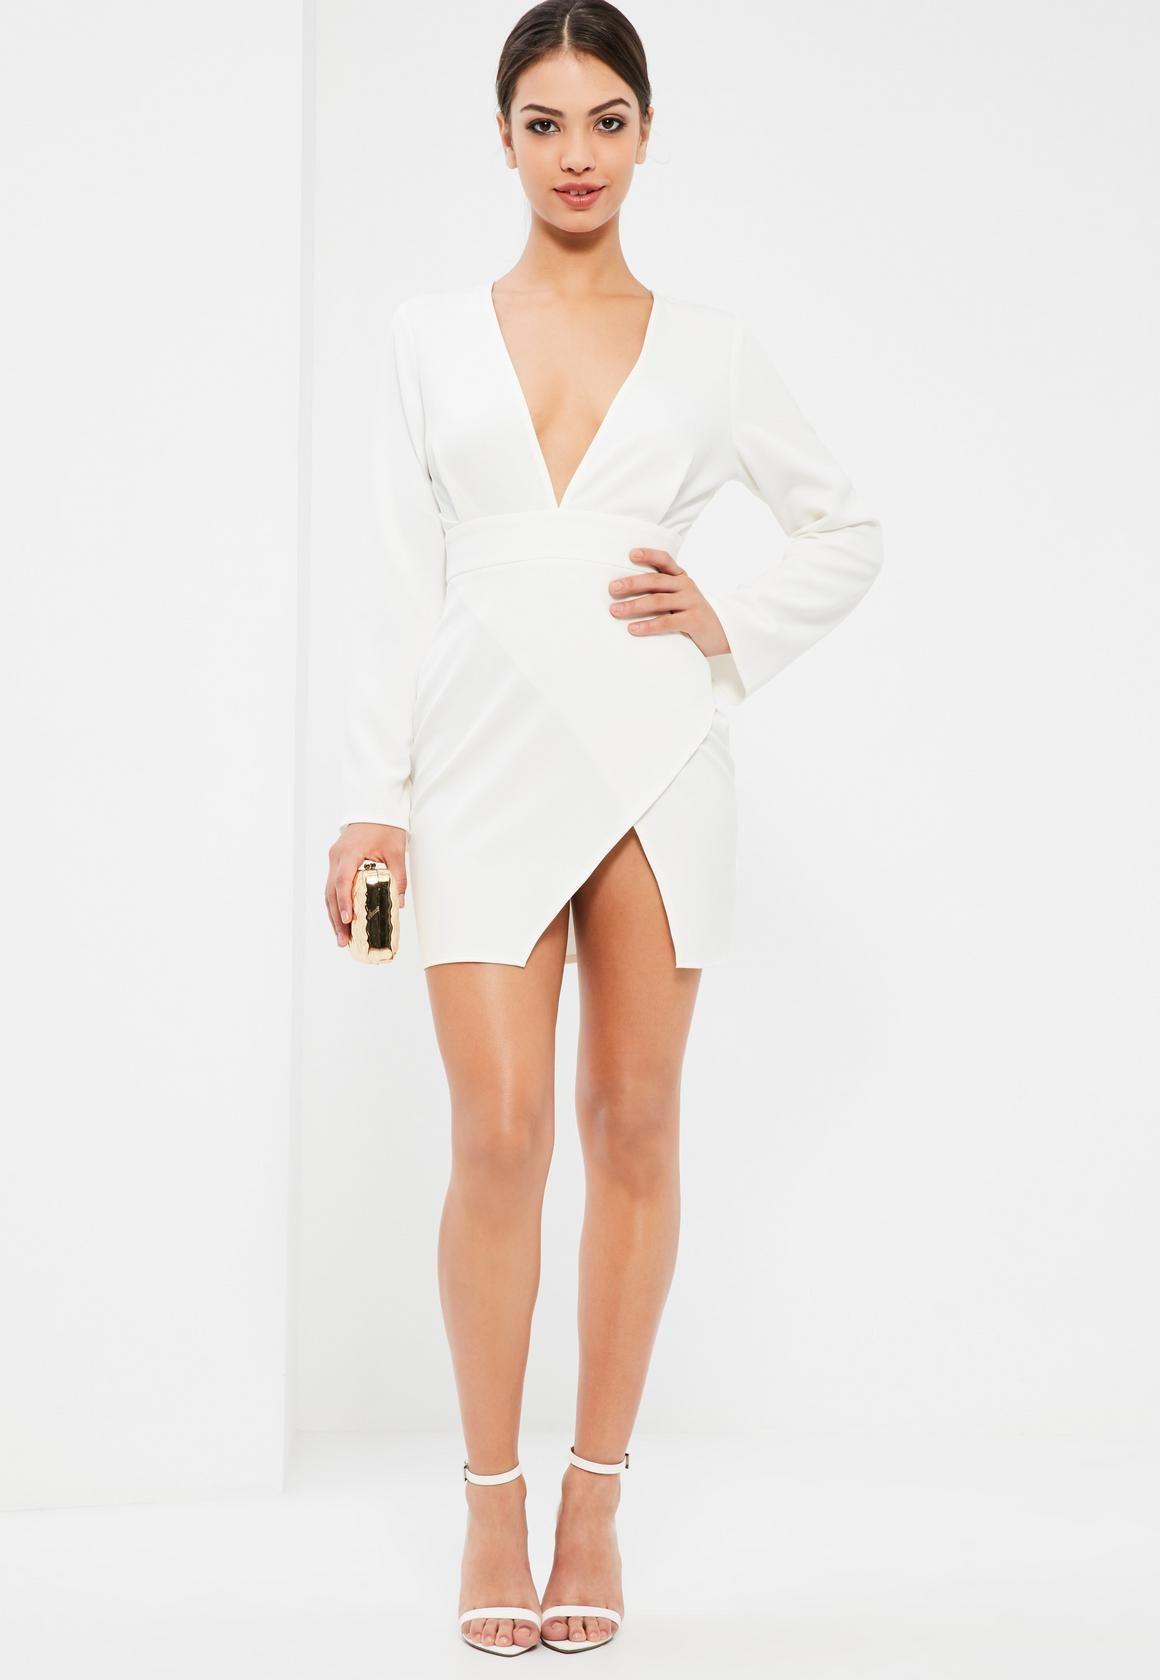 0c0983e0c Missguided - Vestido Asimétrico Ajustado con Cuello de Pluma en Blanco